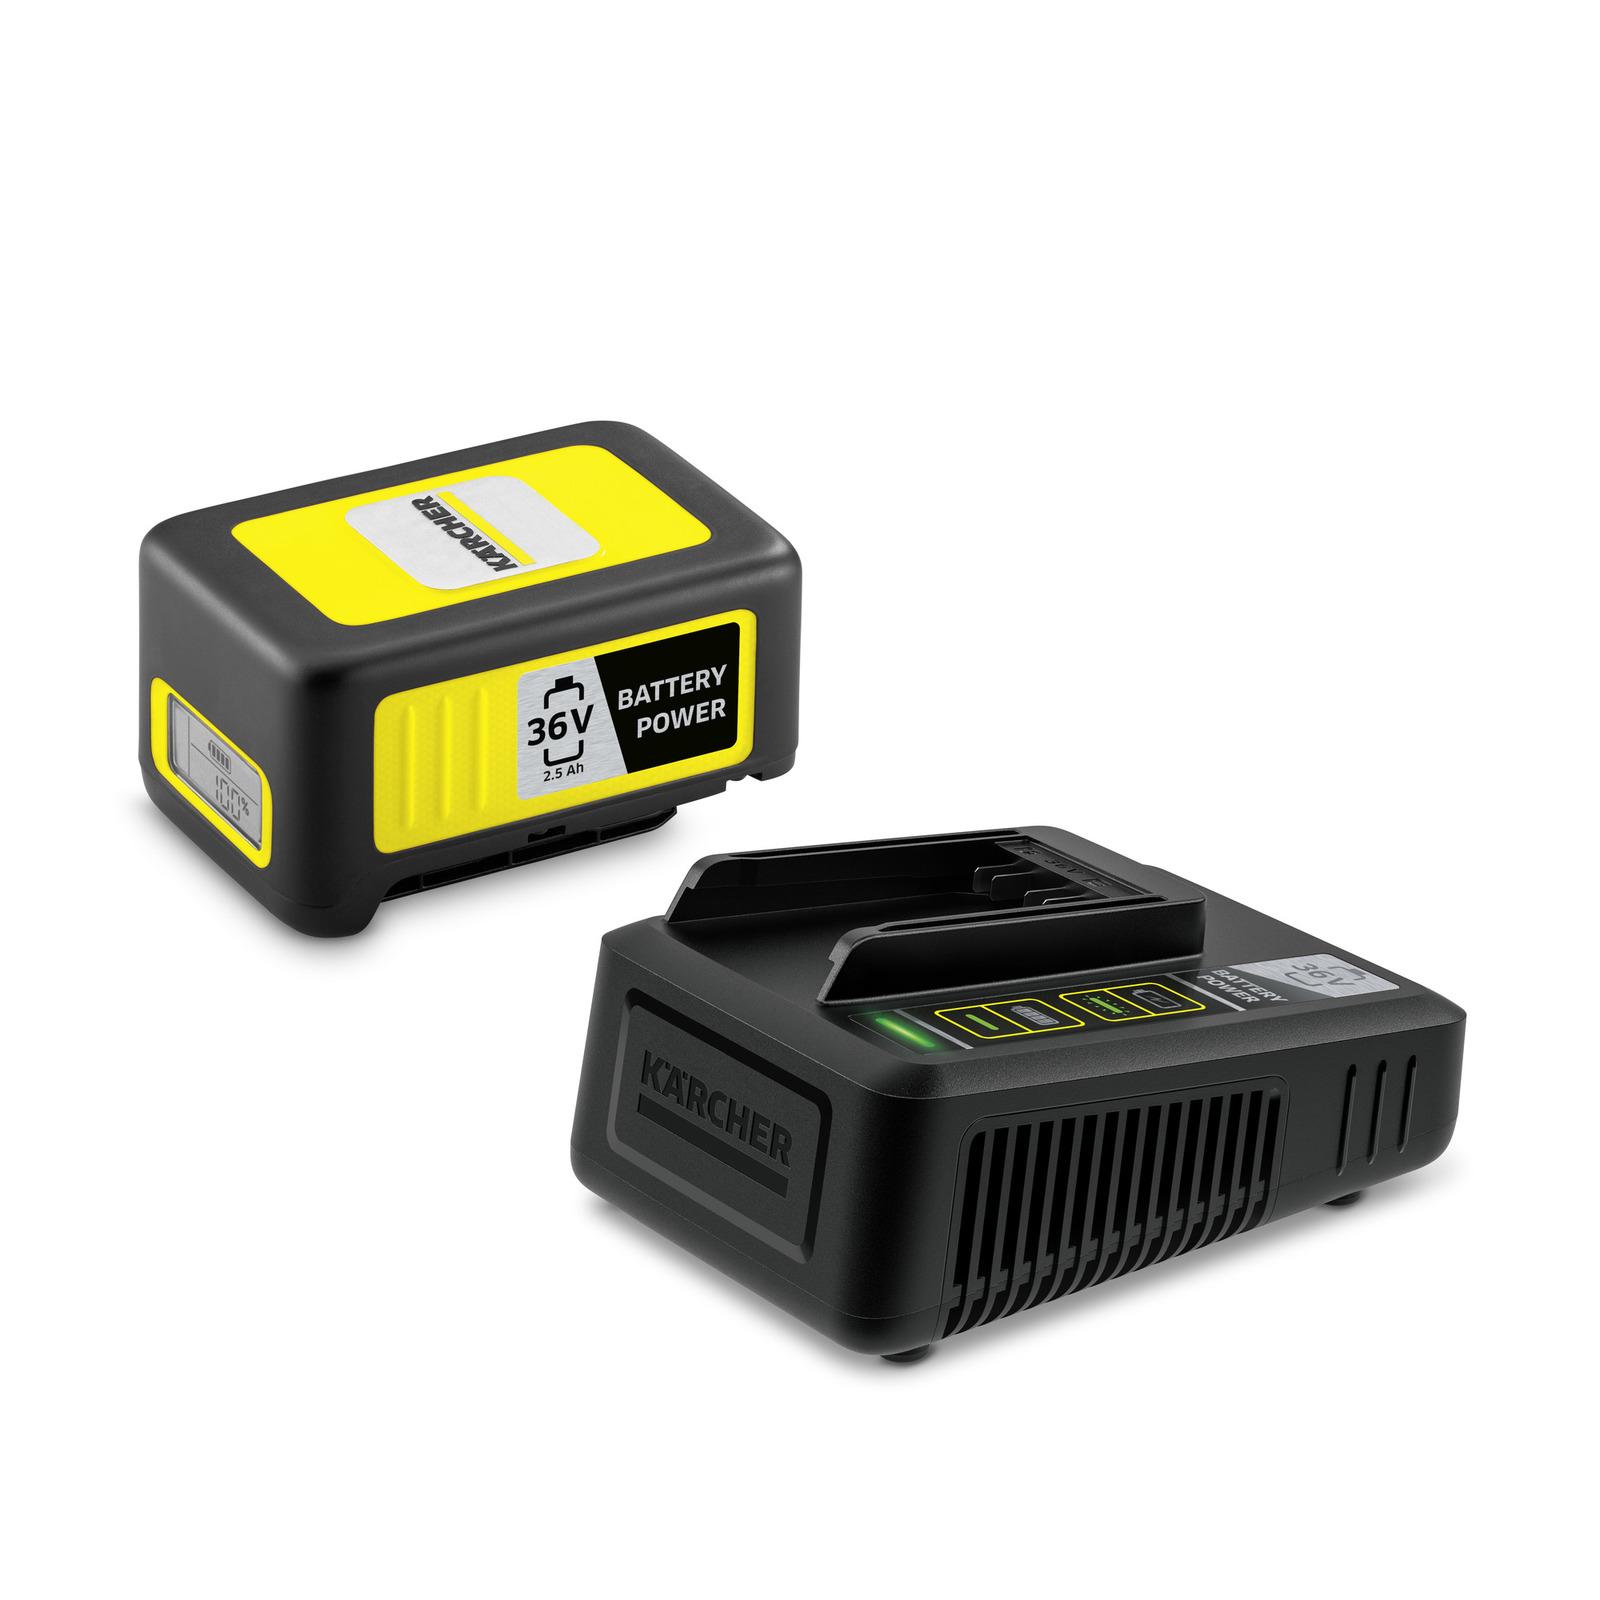 E-shop Kärcher - Starter kit Battery Power 36/25